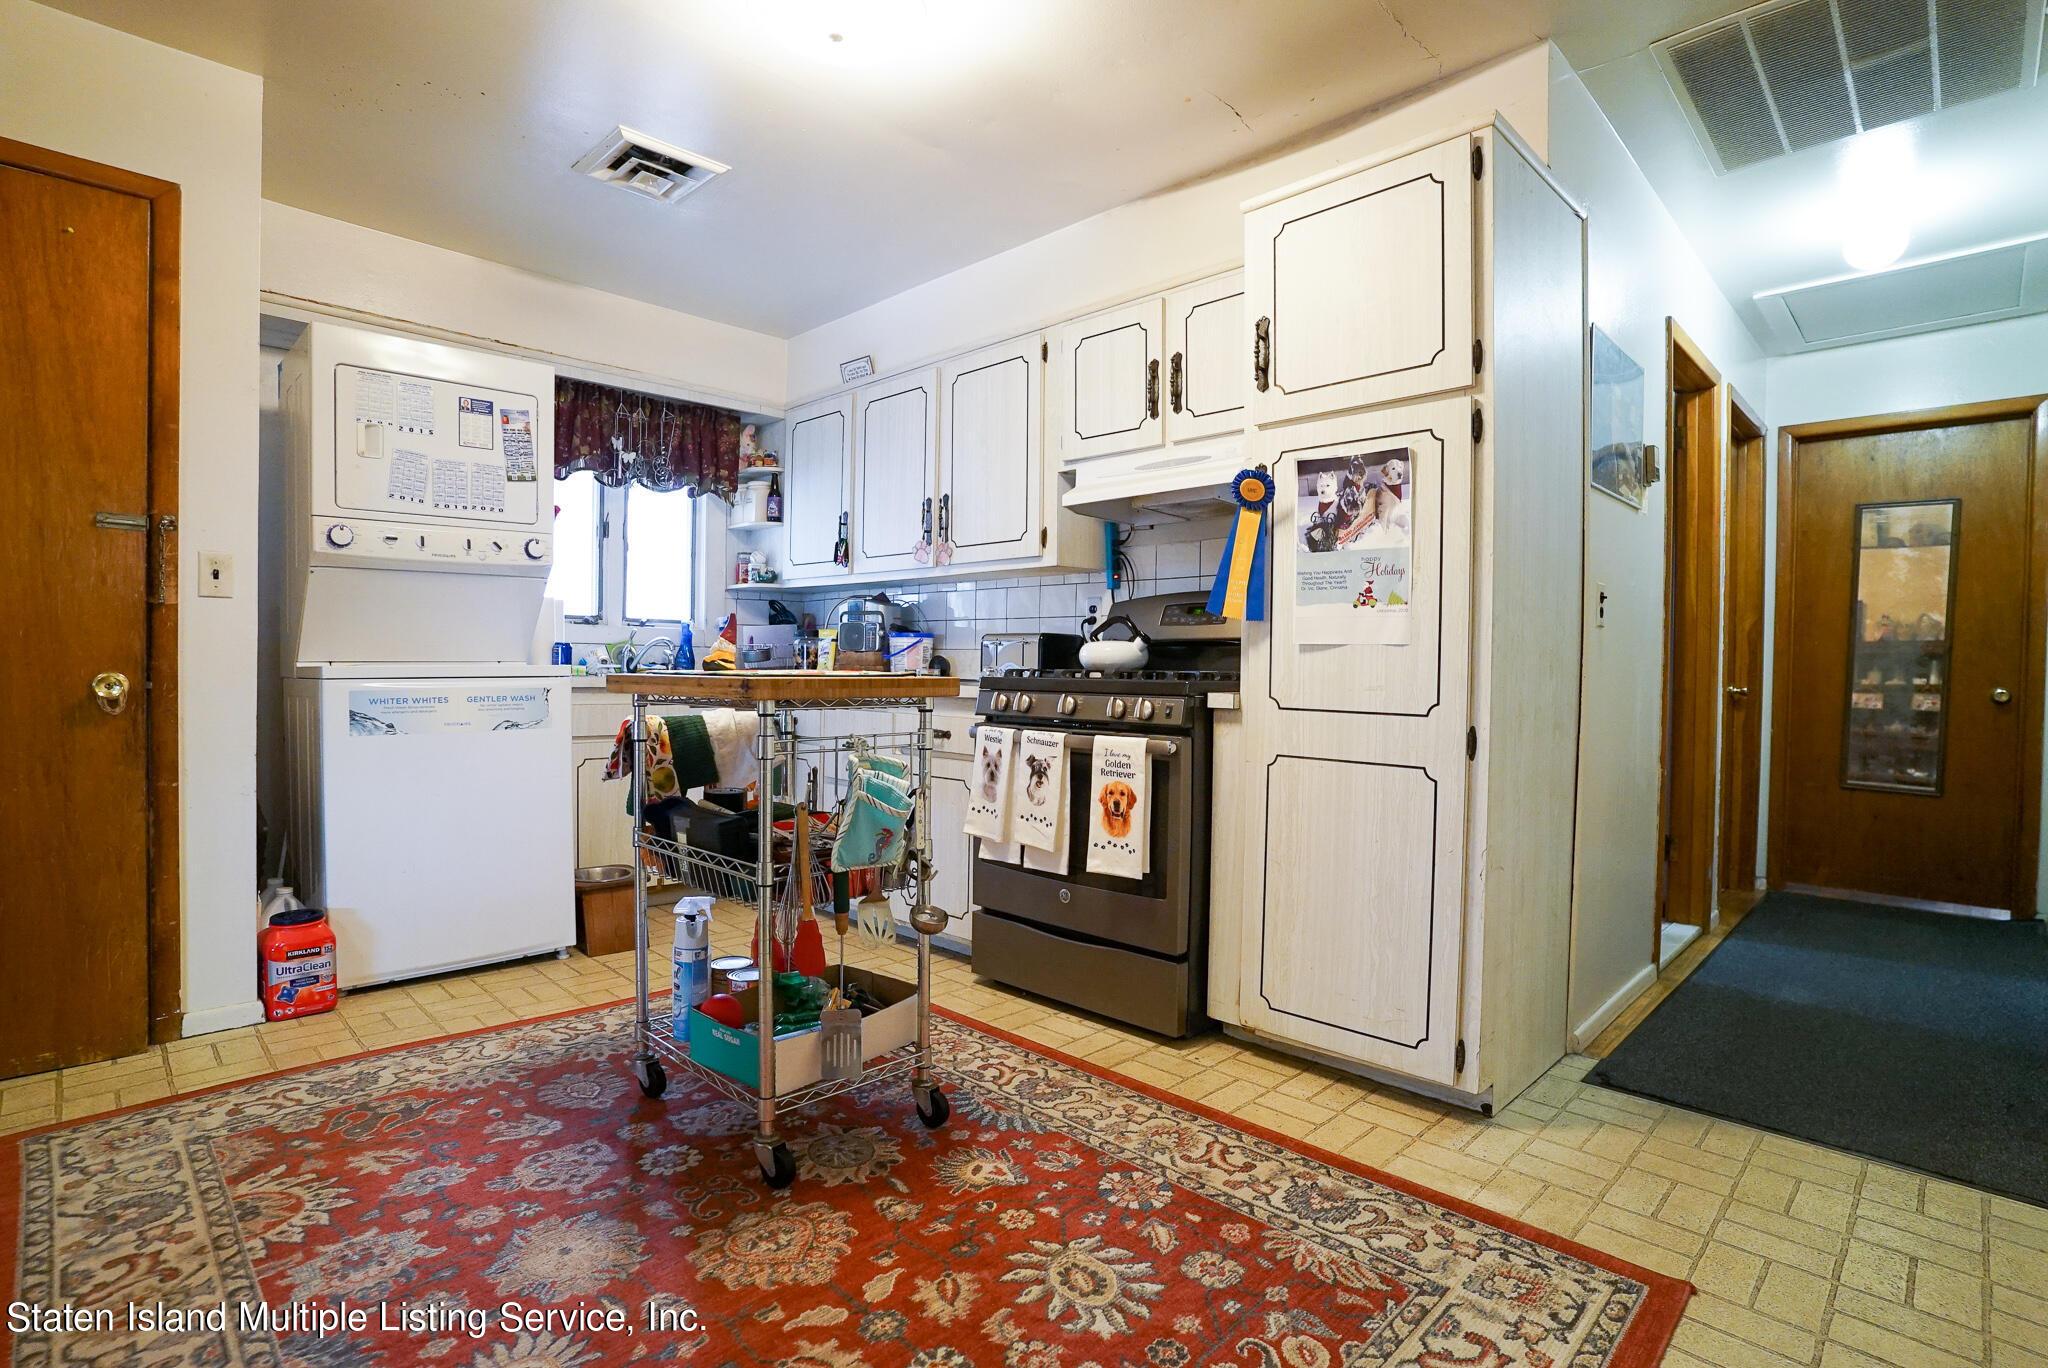 Single Family - Detached 121 Parkinson Avenue  Staten Island, NY 10305, MLS-1147747-14